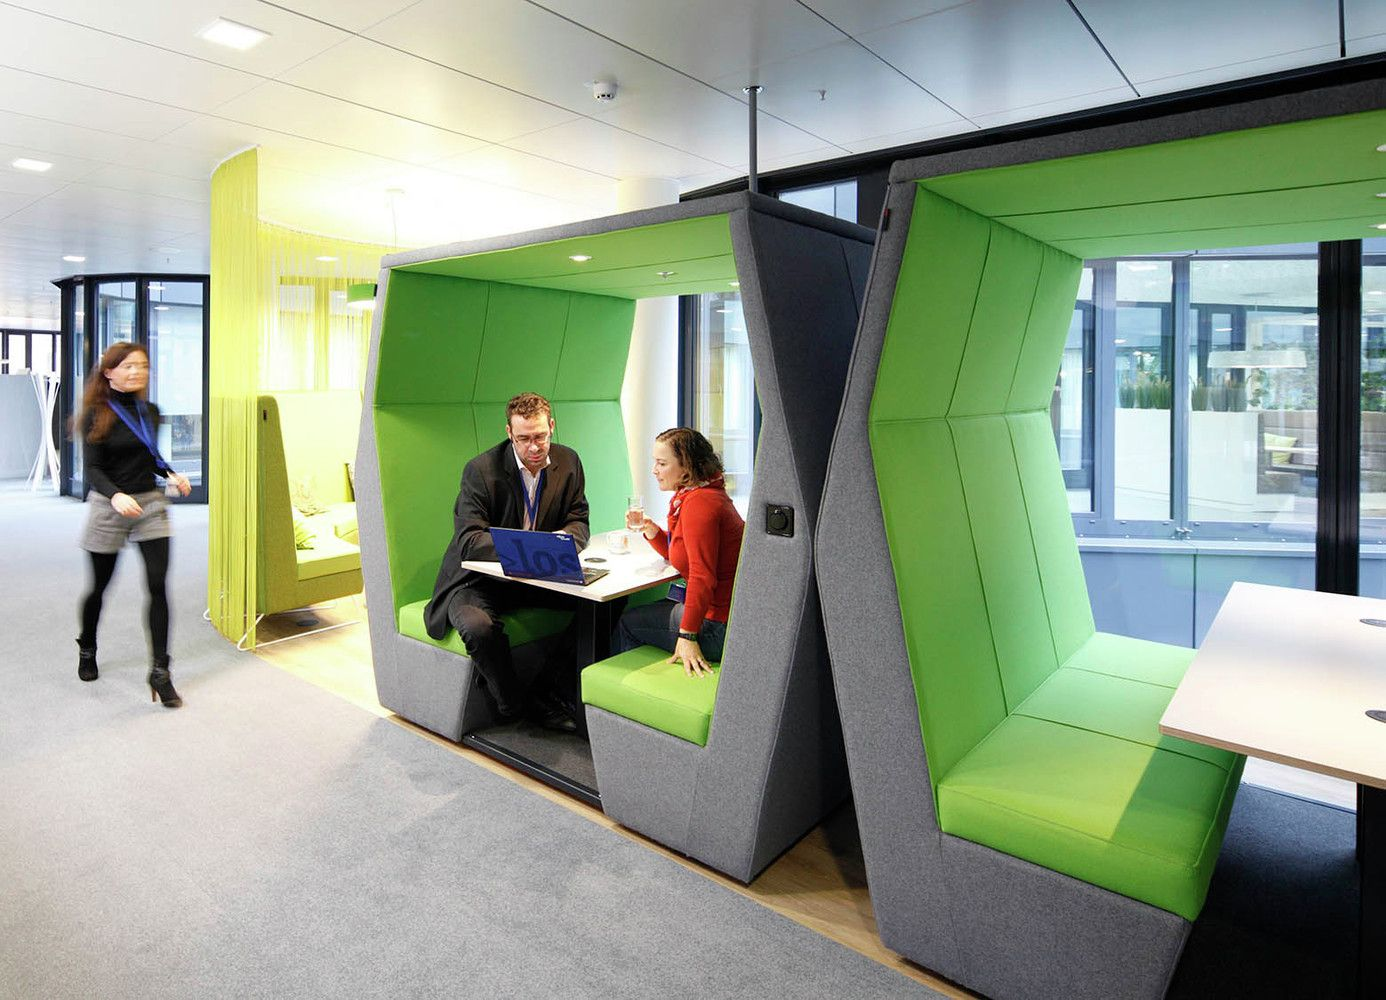 Gallery Of Easycredit Haus Evolution Design 27 In 2020 Office Interior Design Workplace Design Design